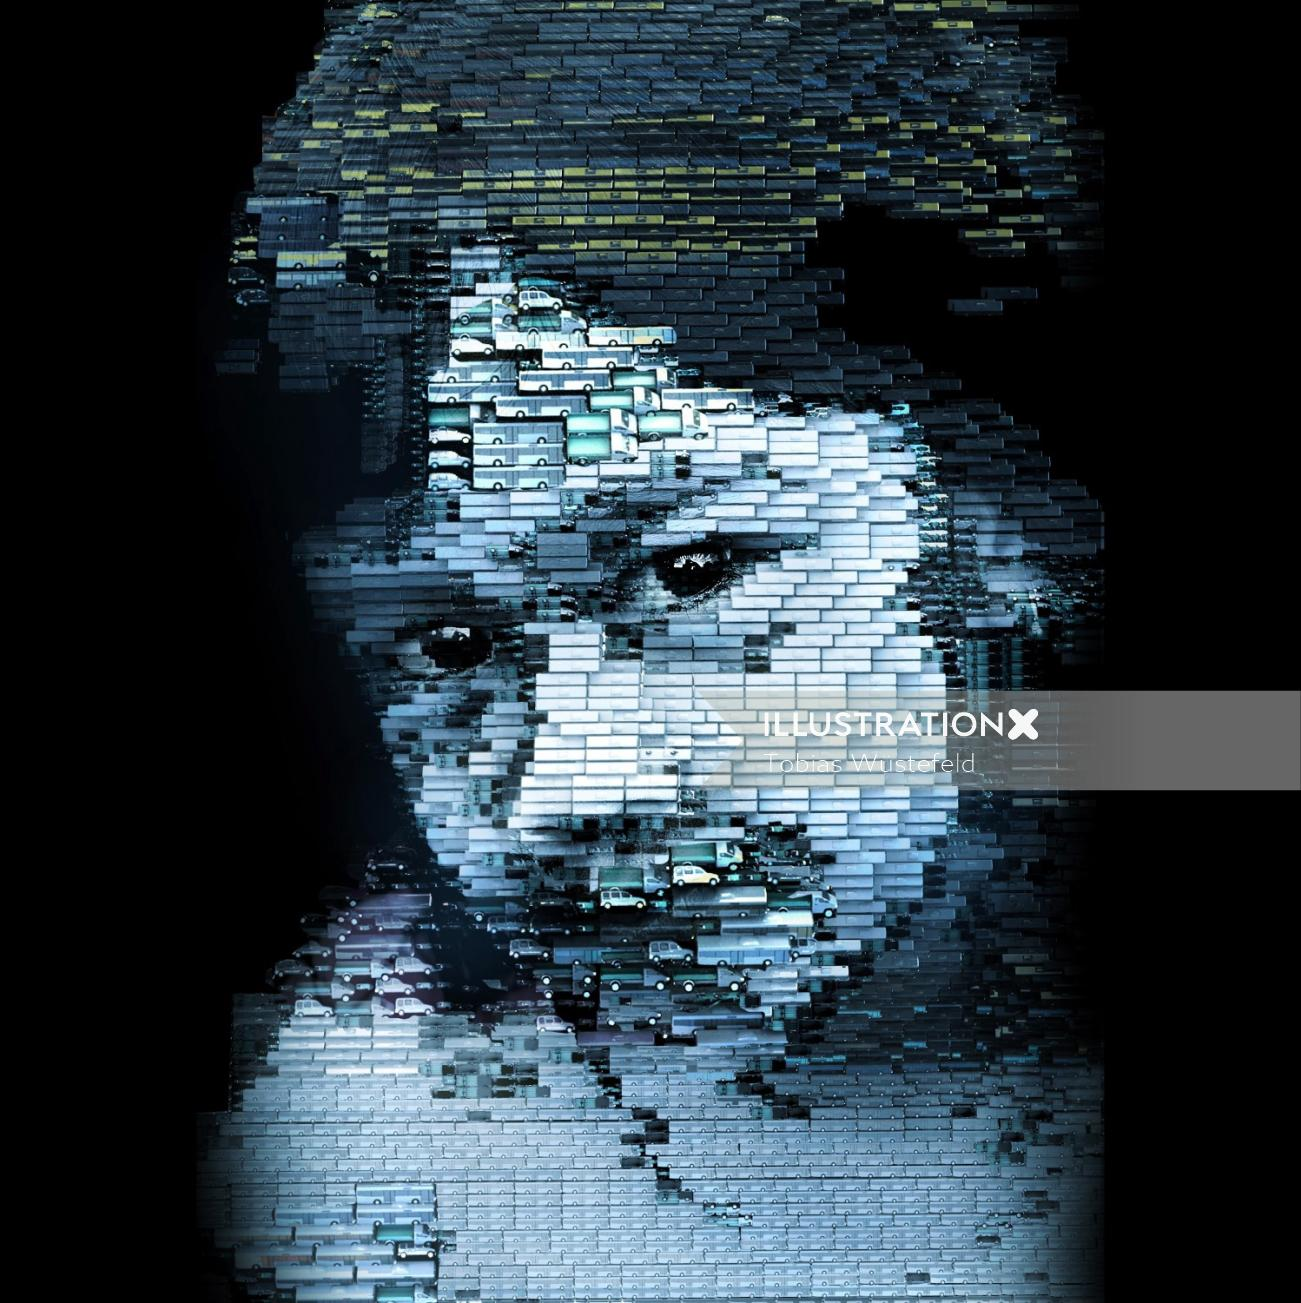 Portrait illustration of small girl